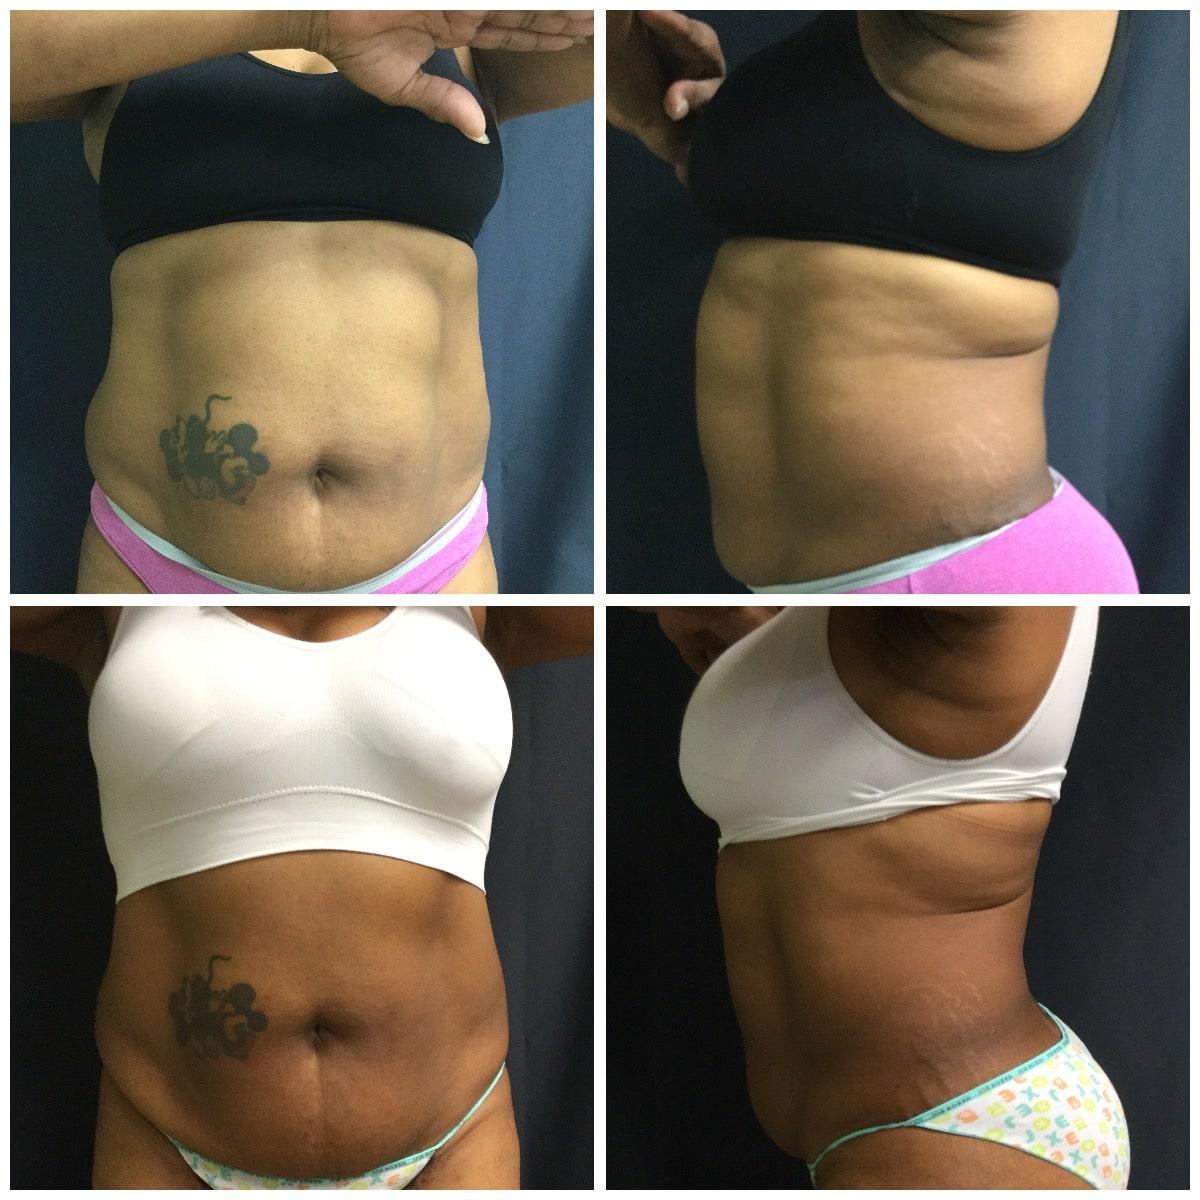 weight loss affordable beauty, sculpsure treatment in kenosha wi, kenosha fat loss